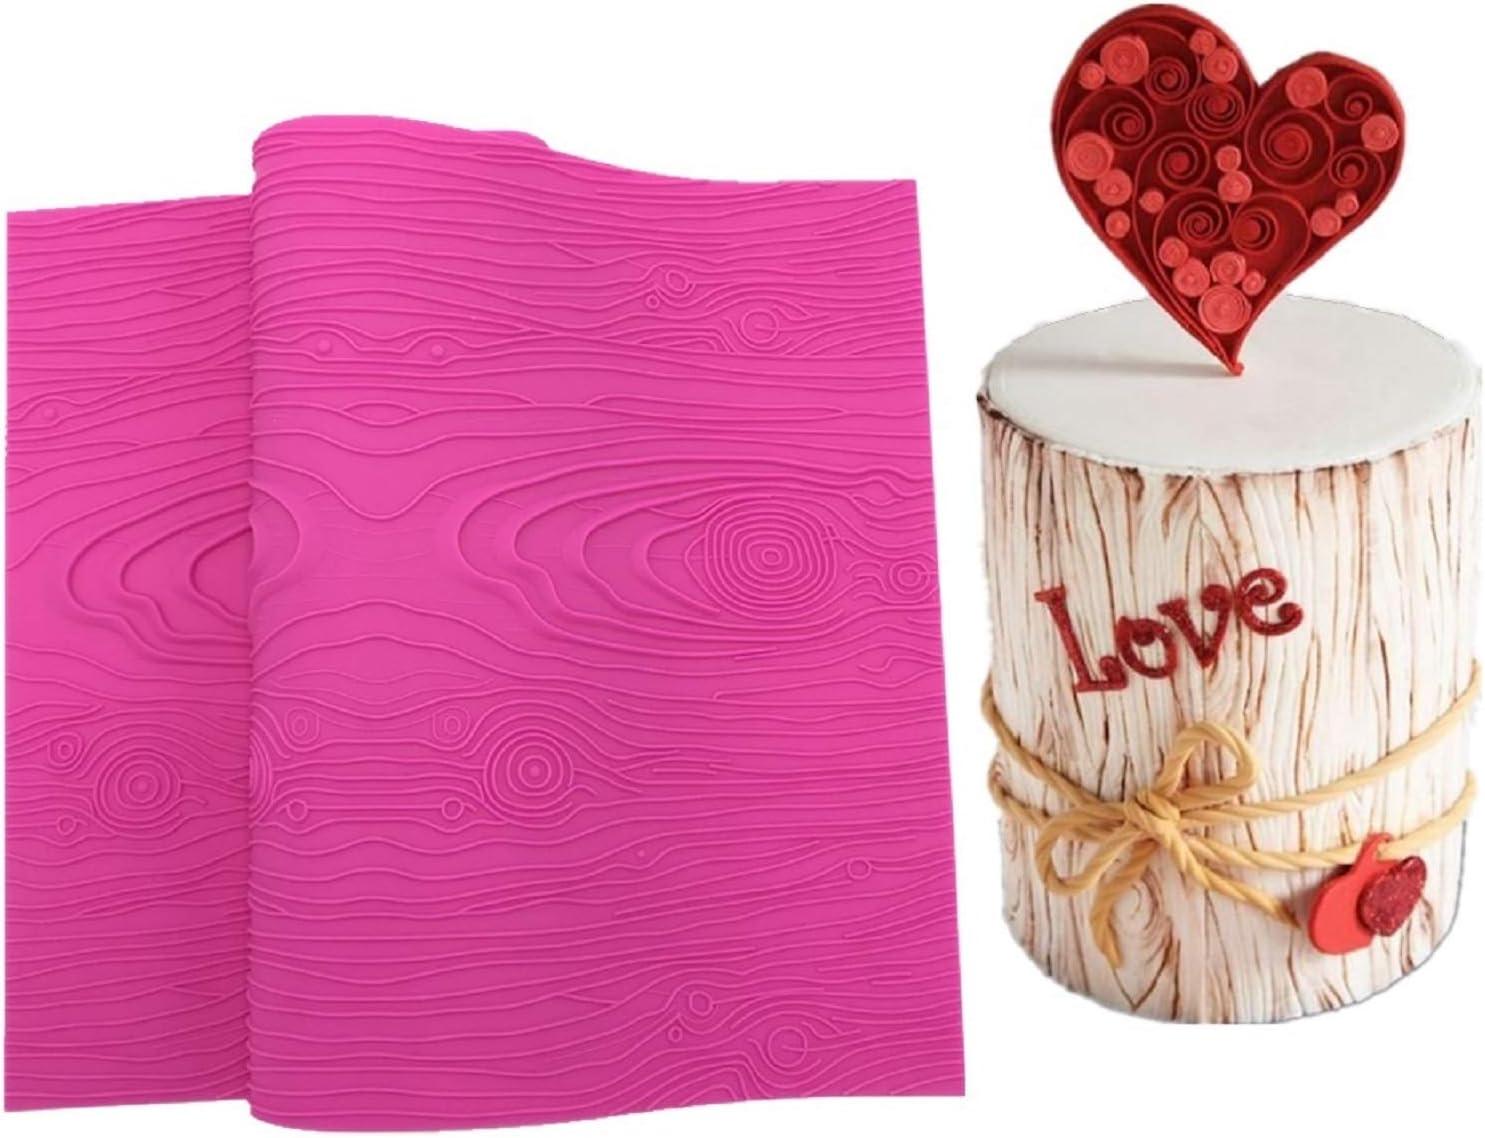 Kulepin Woodgrain Lace Silicone Mold Fondant Wooden Impression Lace Mat DIY for Cake Decorating